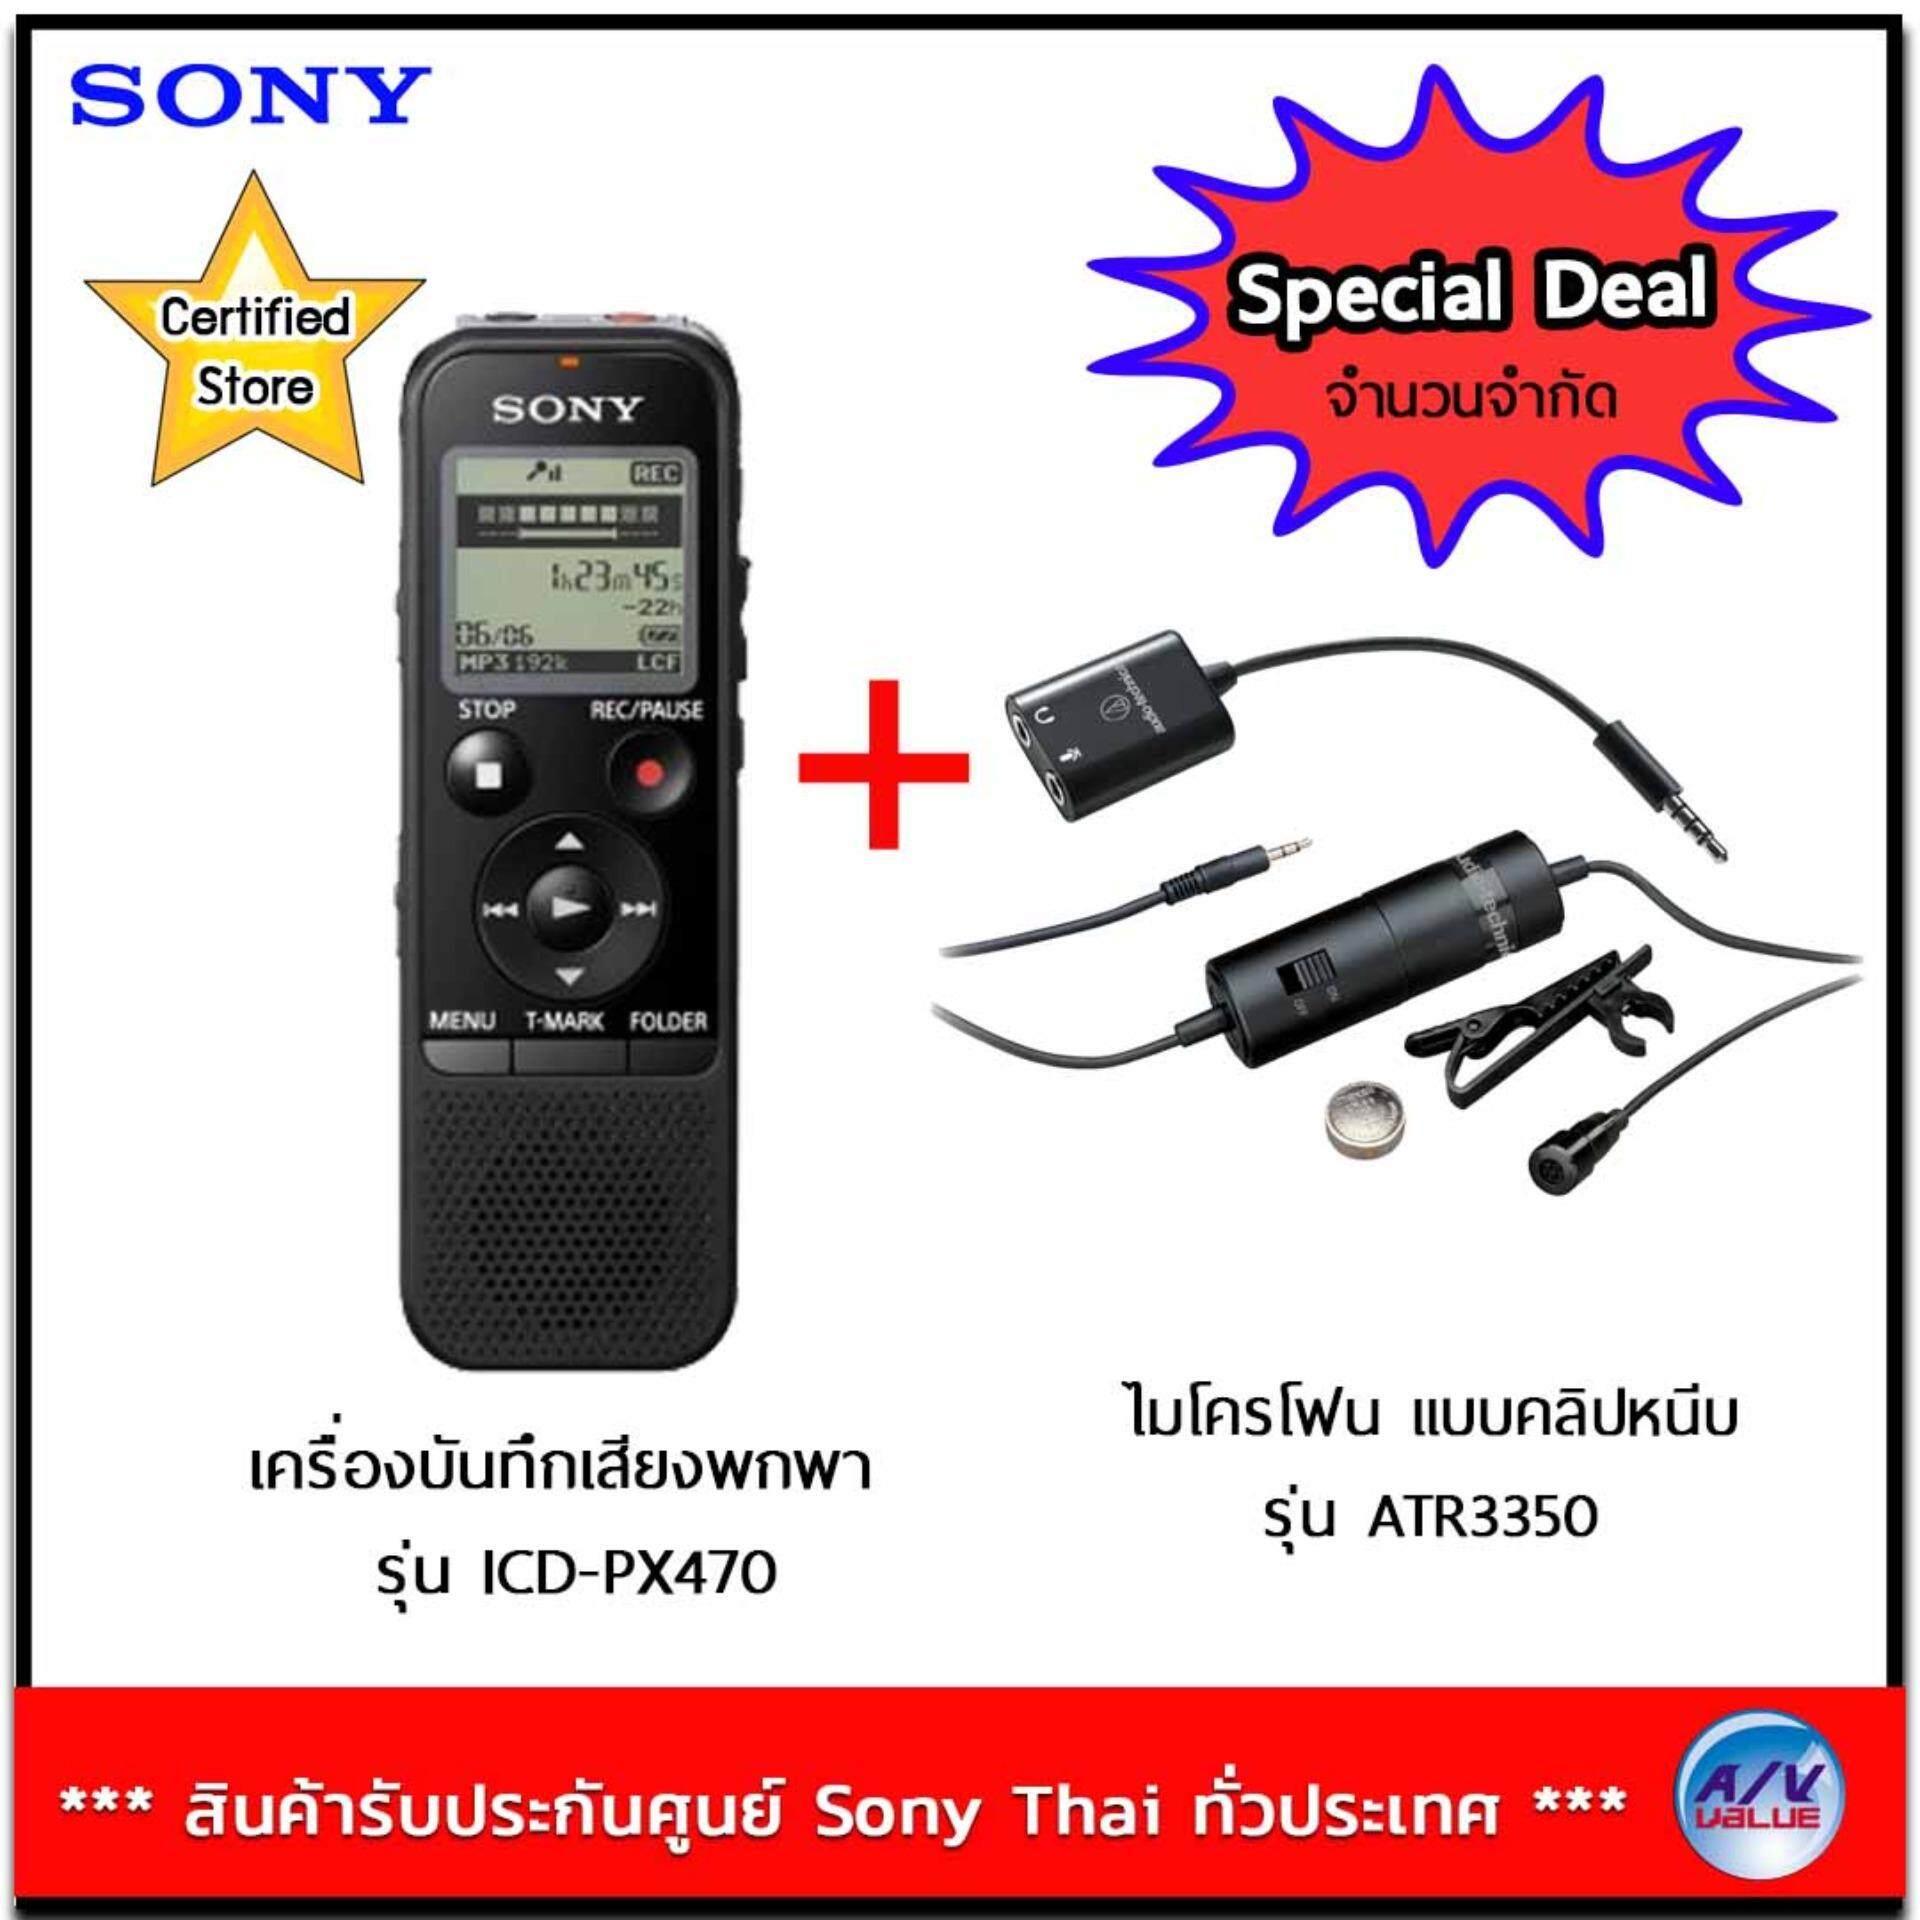 Sony เครื่องบันทึกเสียงพกพา พร้อม Usb ในตัว รุ่น Icd-Px470 + Audio Technica Atr3350 By Av Value Mbk